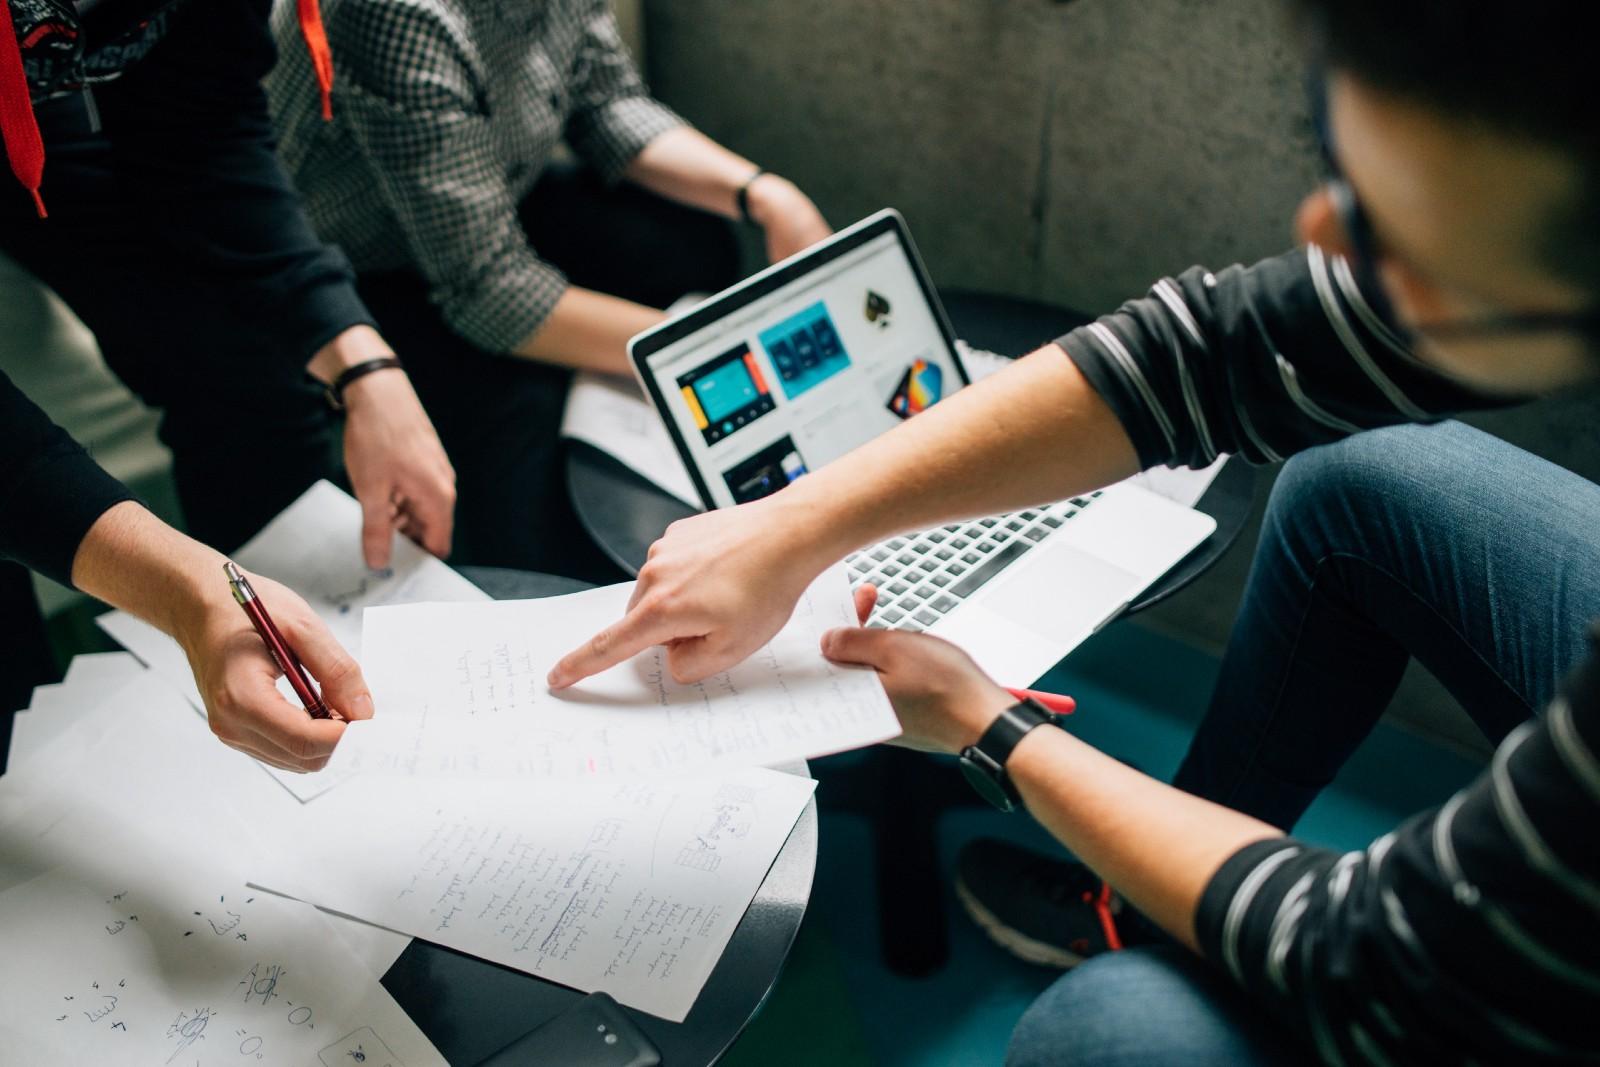 """A group of people brainstorming over a laptop and sheets of paper"" by  Štefan Štefančík  on  Unsplash"